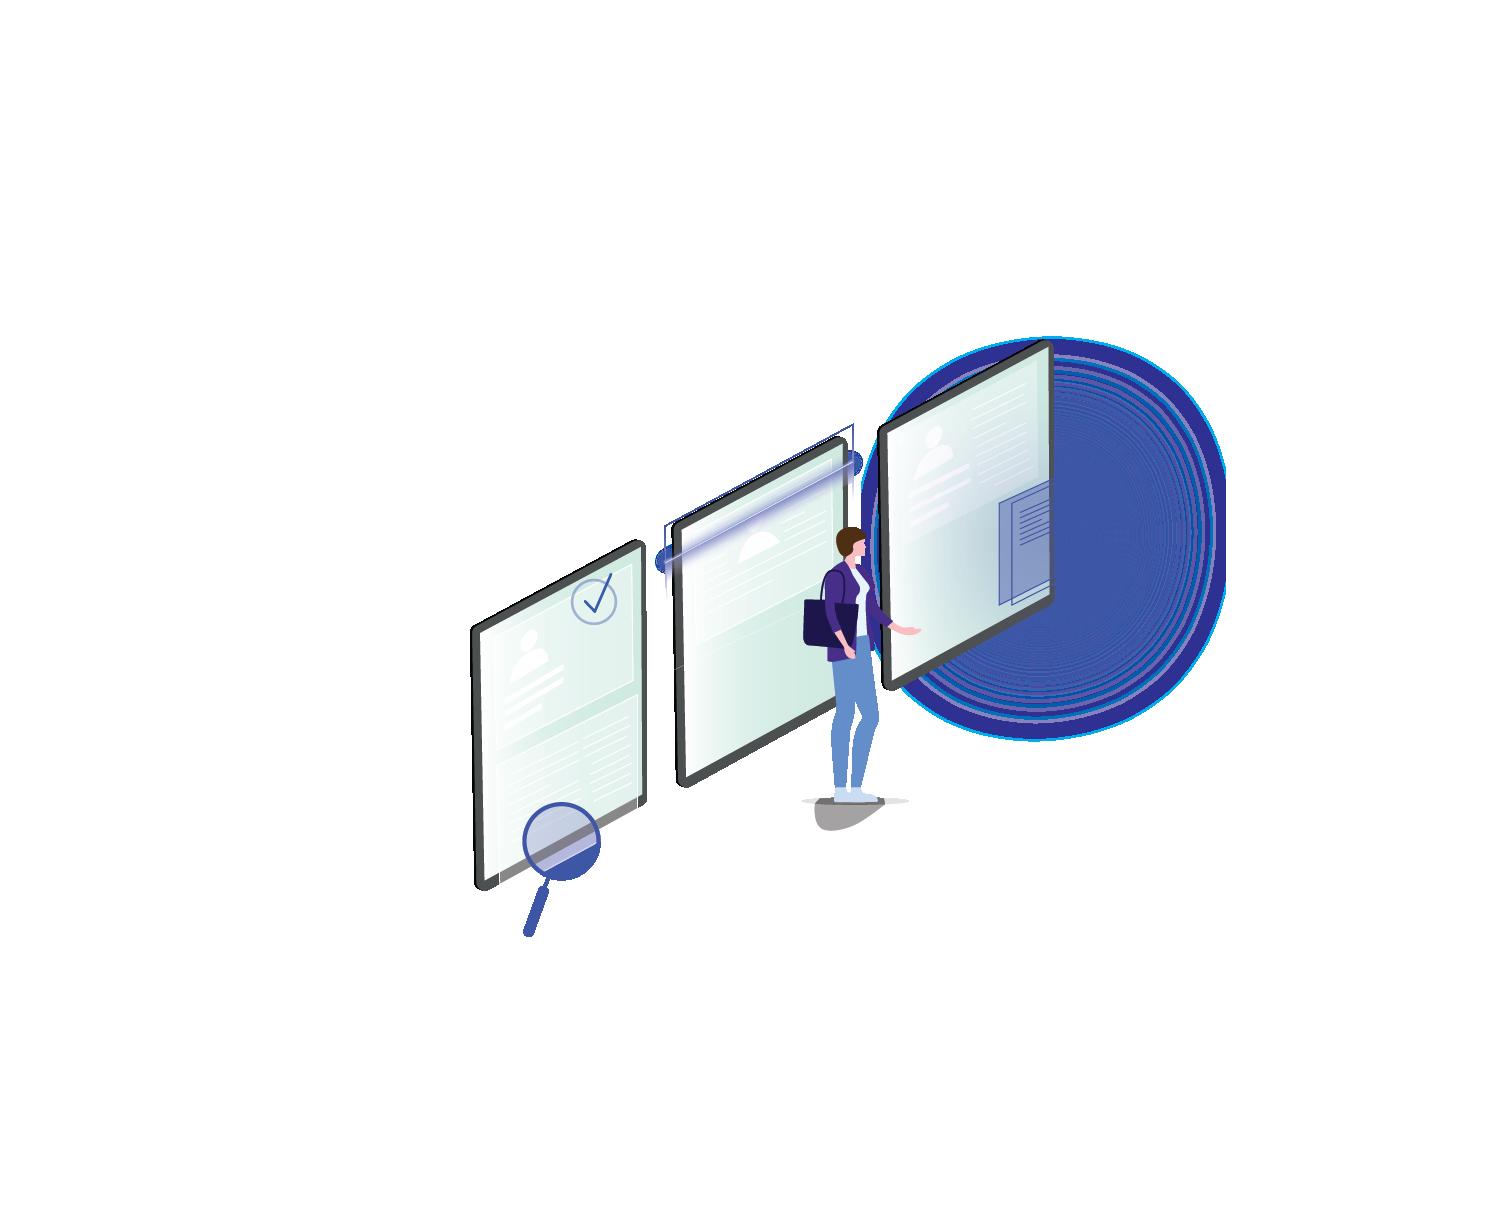 background check illustration technology